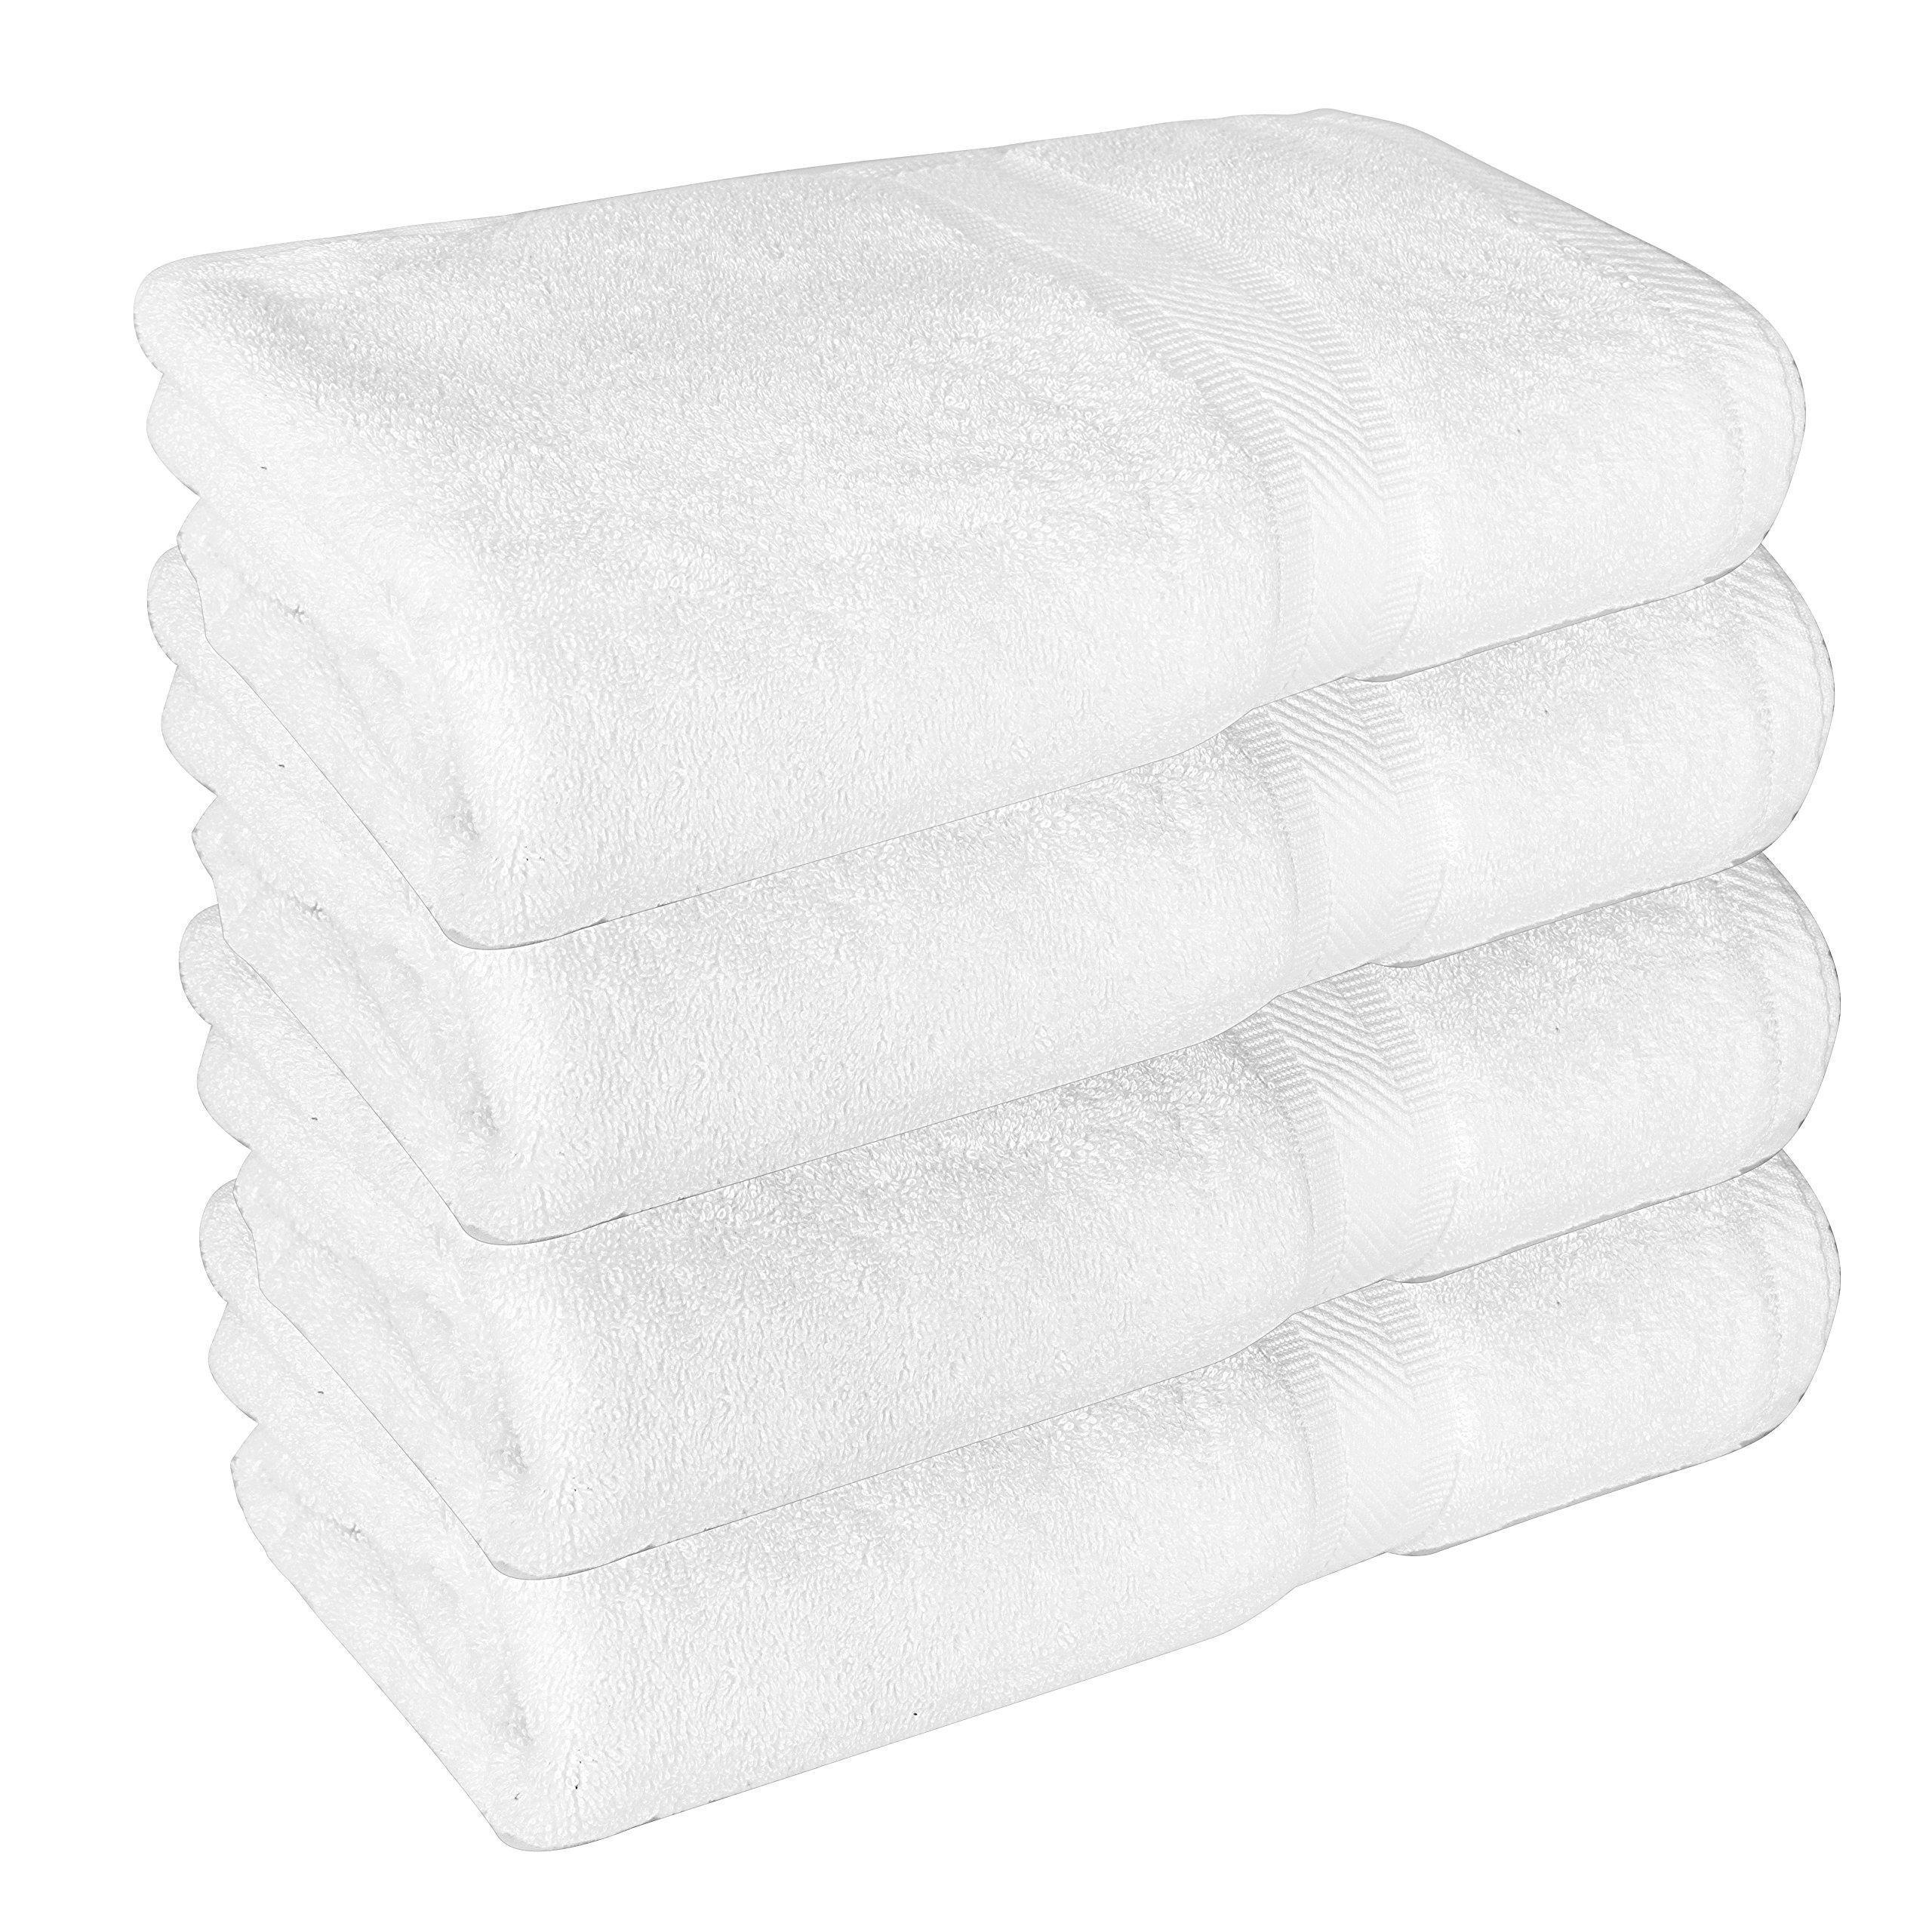 Spa Quality Towels: Premium Bath Towels, Circlet Egyptian Cotton White Towel